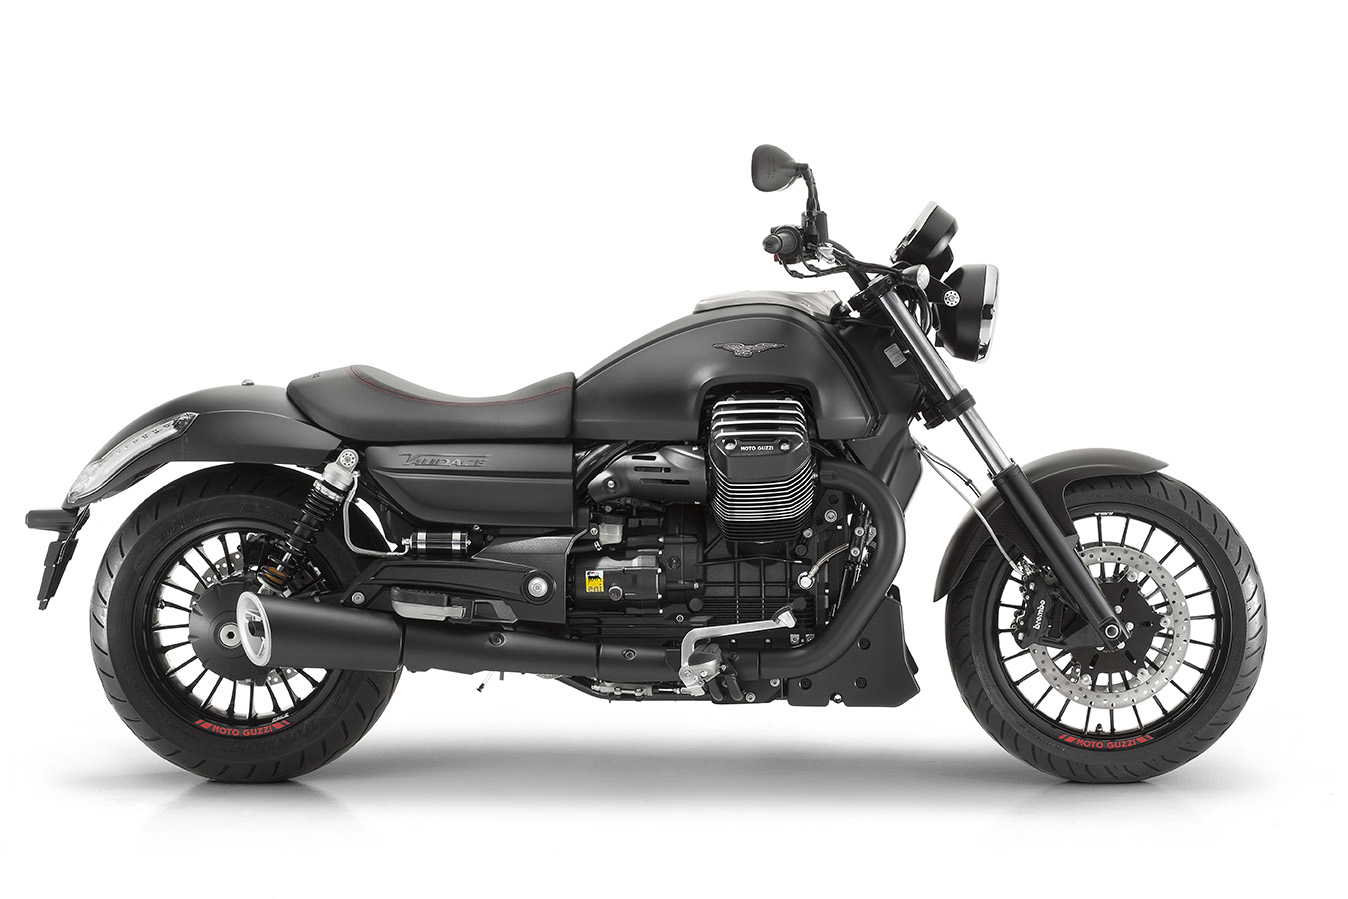 new moto guzzi audace italian muscle motorcycle news editorials. Black Bedroom Furniture Sets. Home Design Ideas